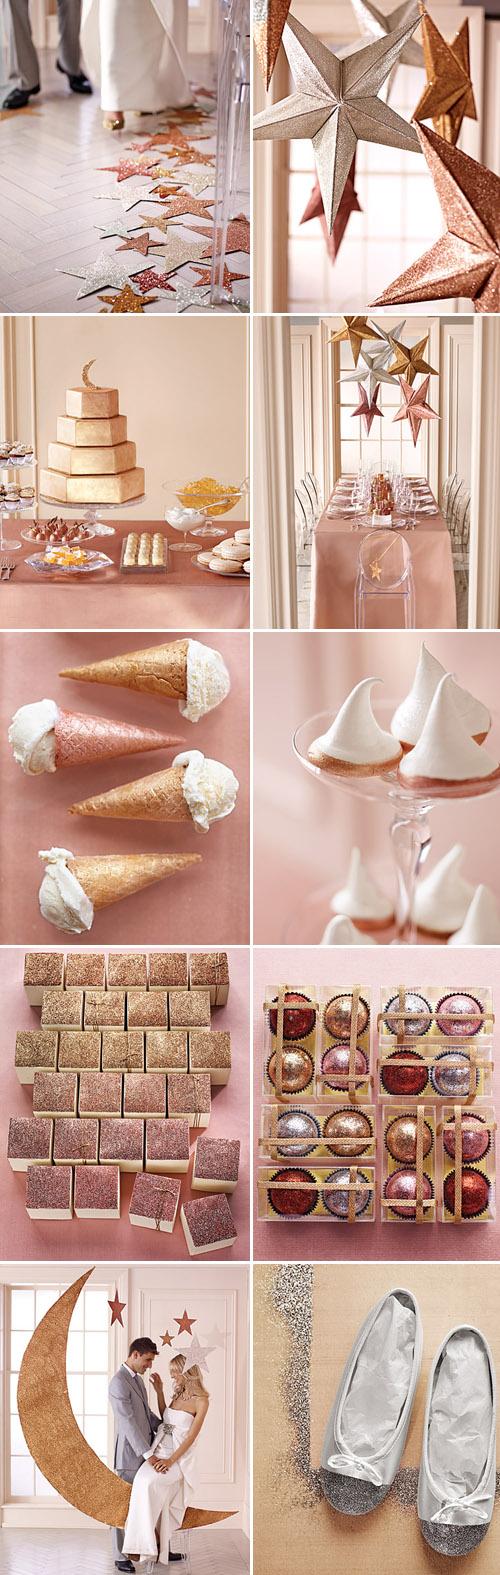 All that Glitters - from MarthaStewart.com   Junebug Weddings